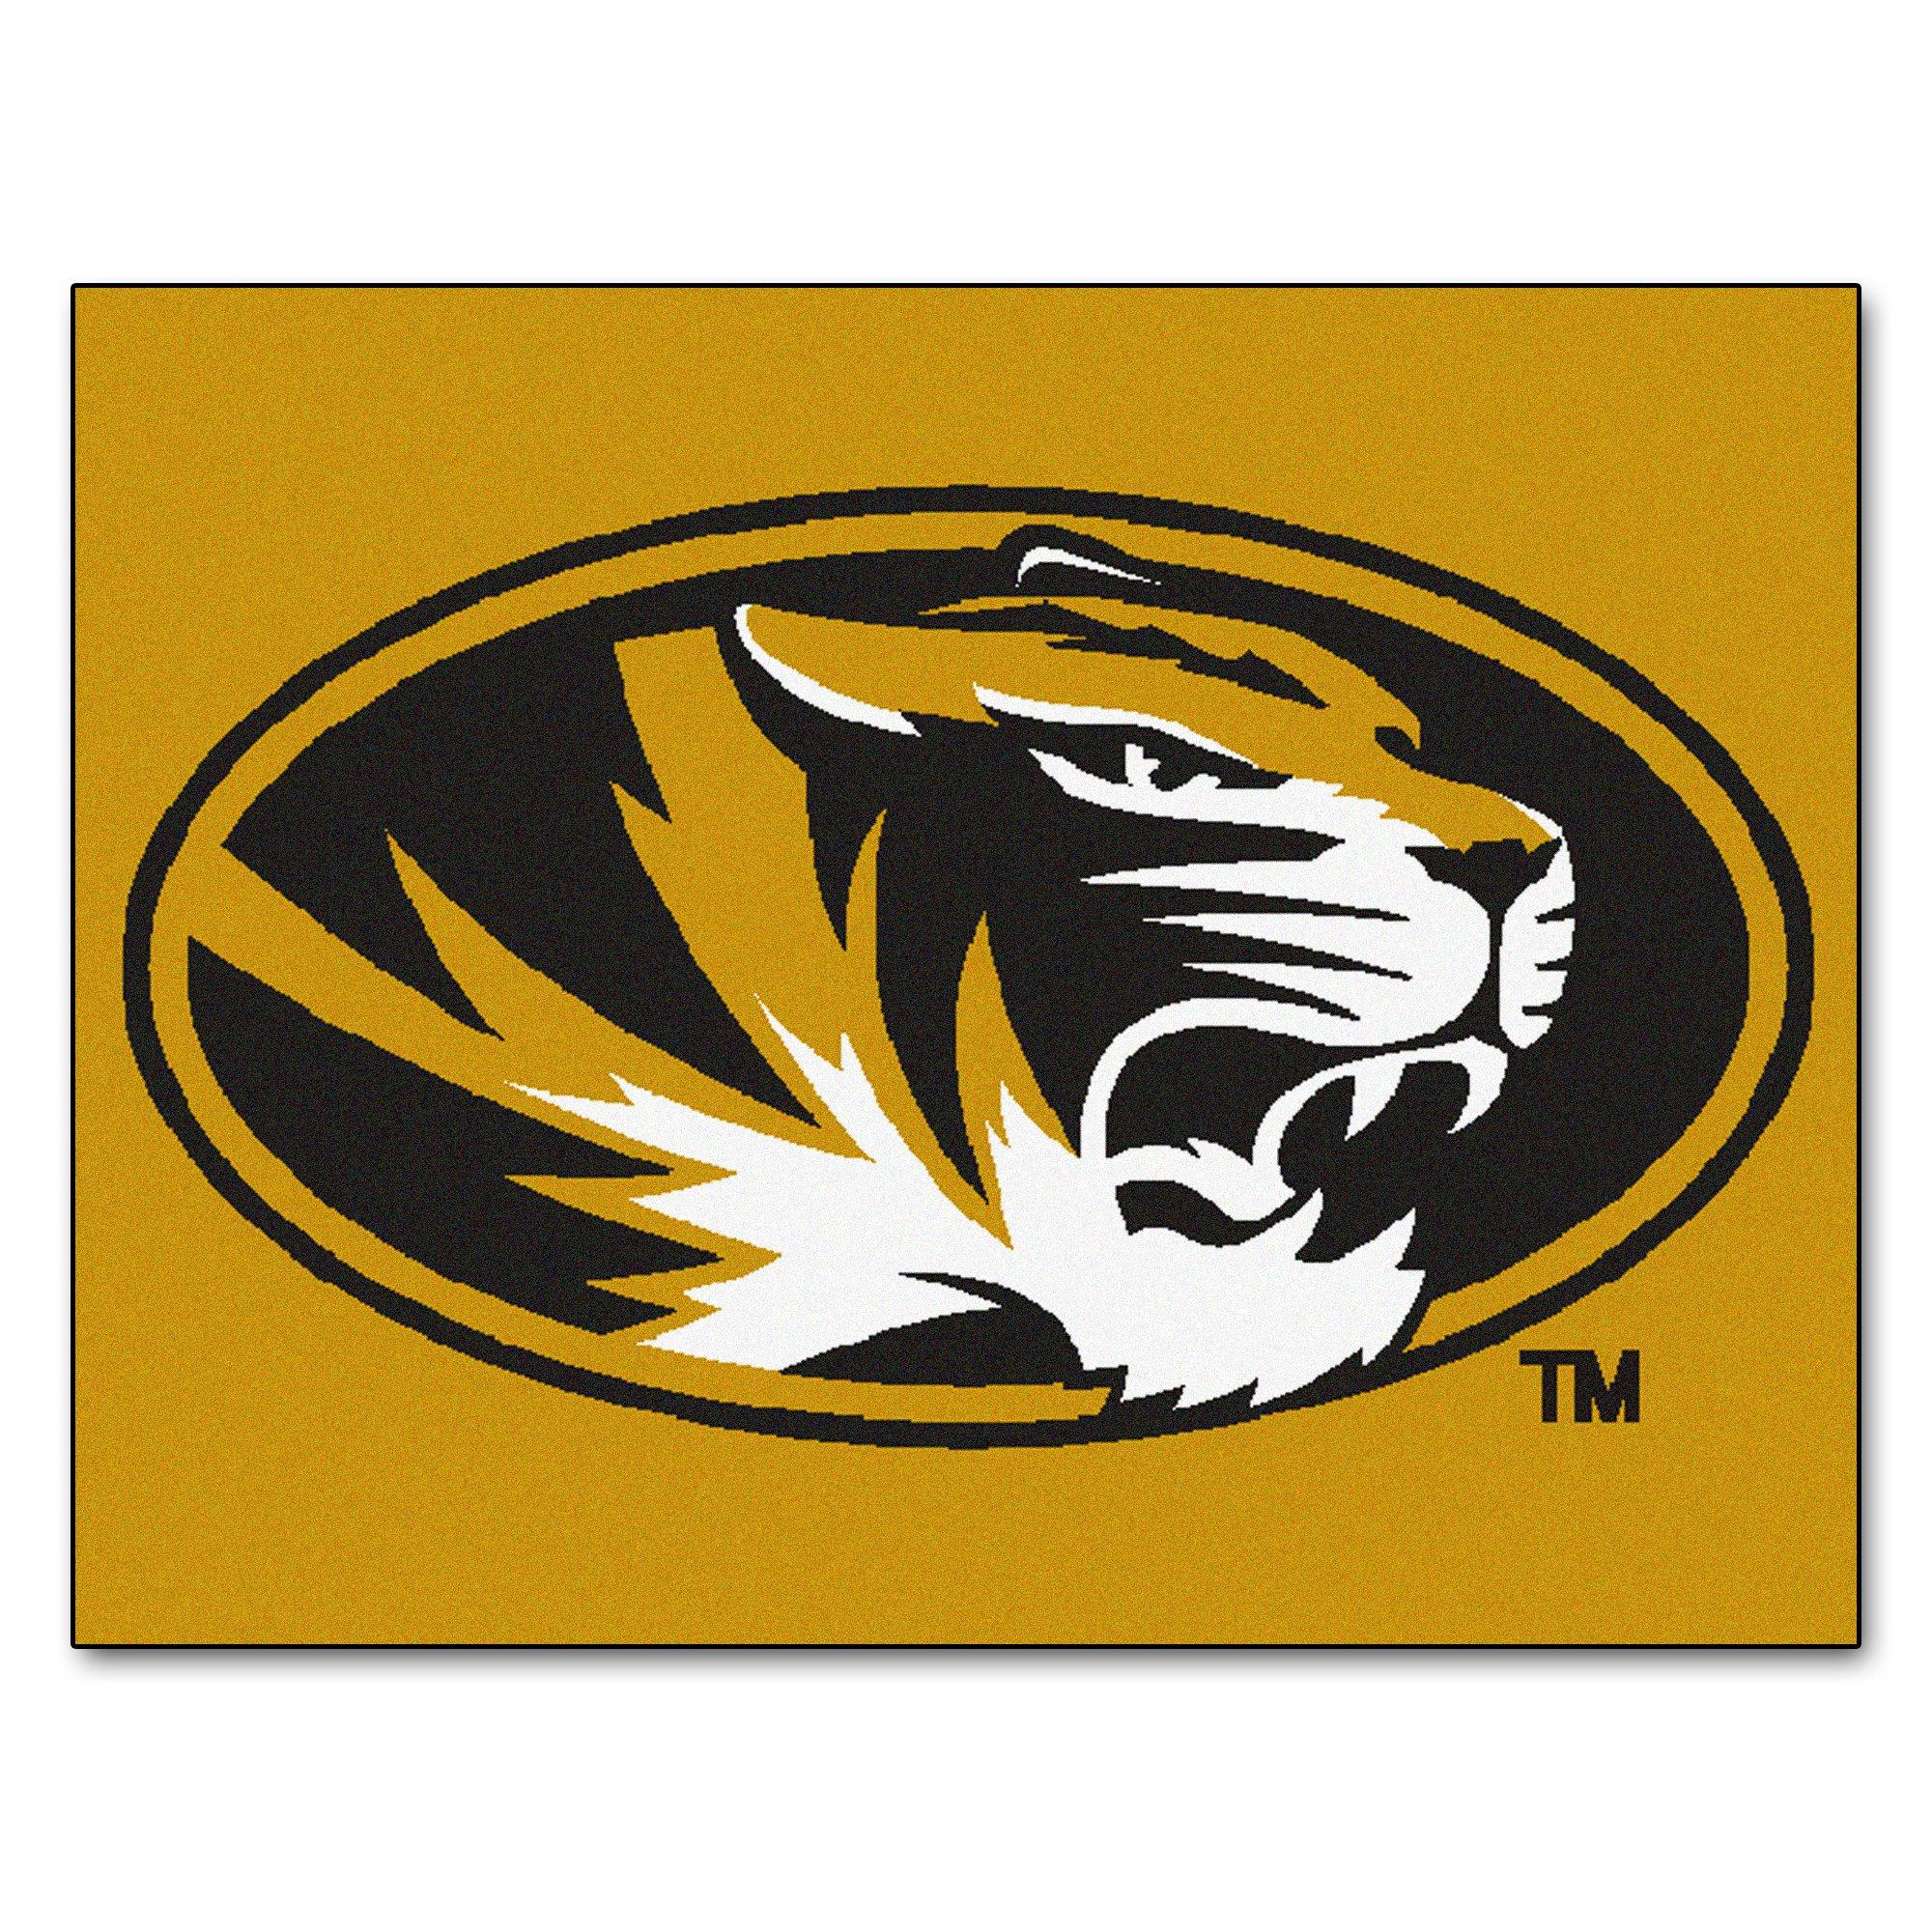 Fanmats NCAA University of Missouri Tigers Nylon Face All-Star Rug